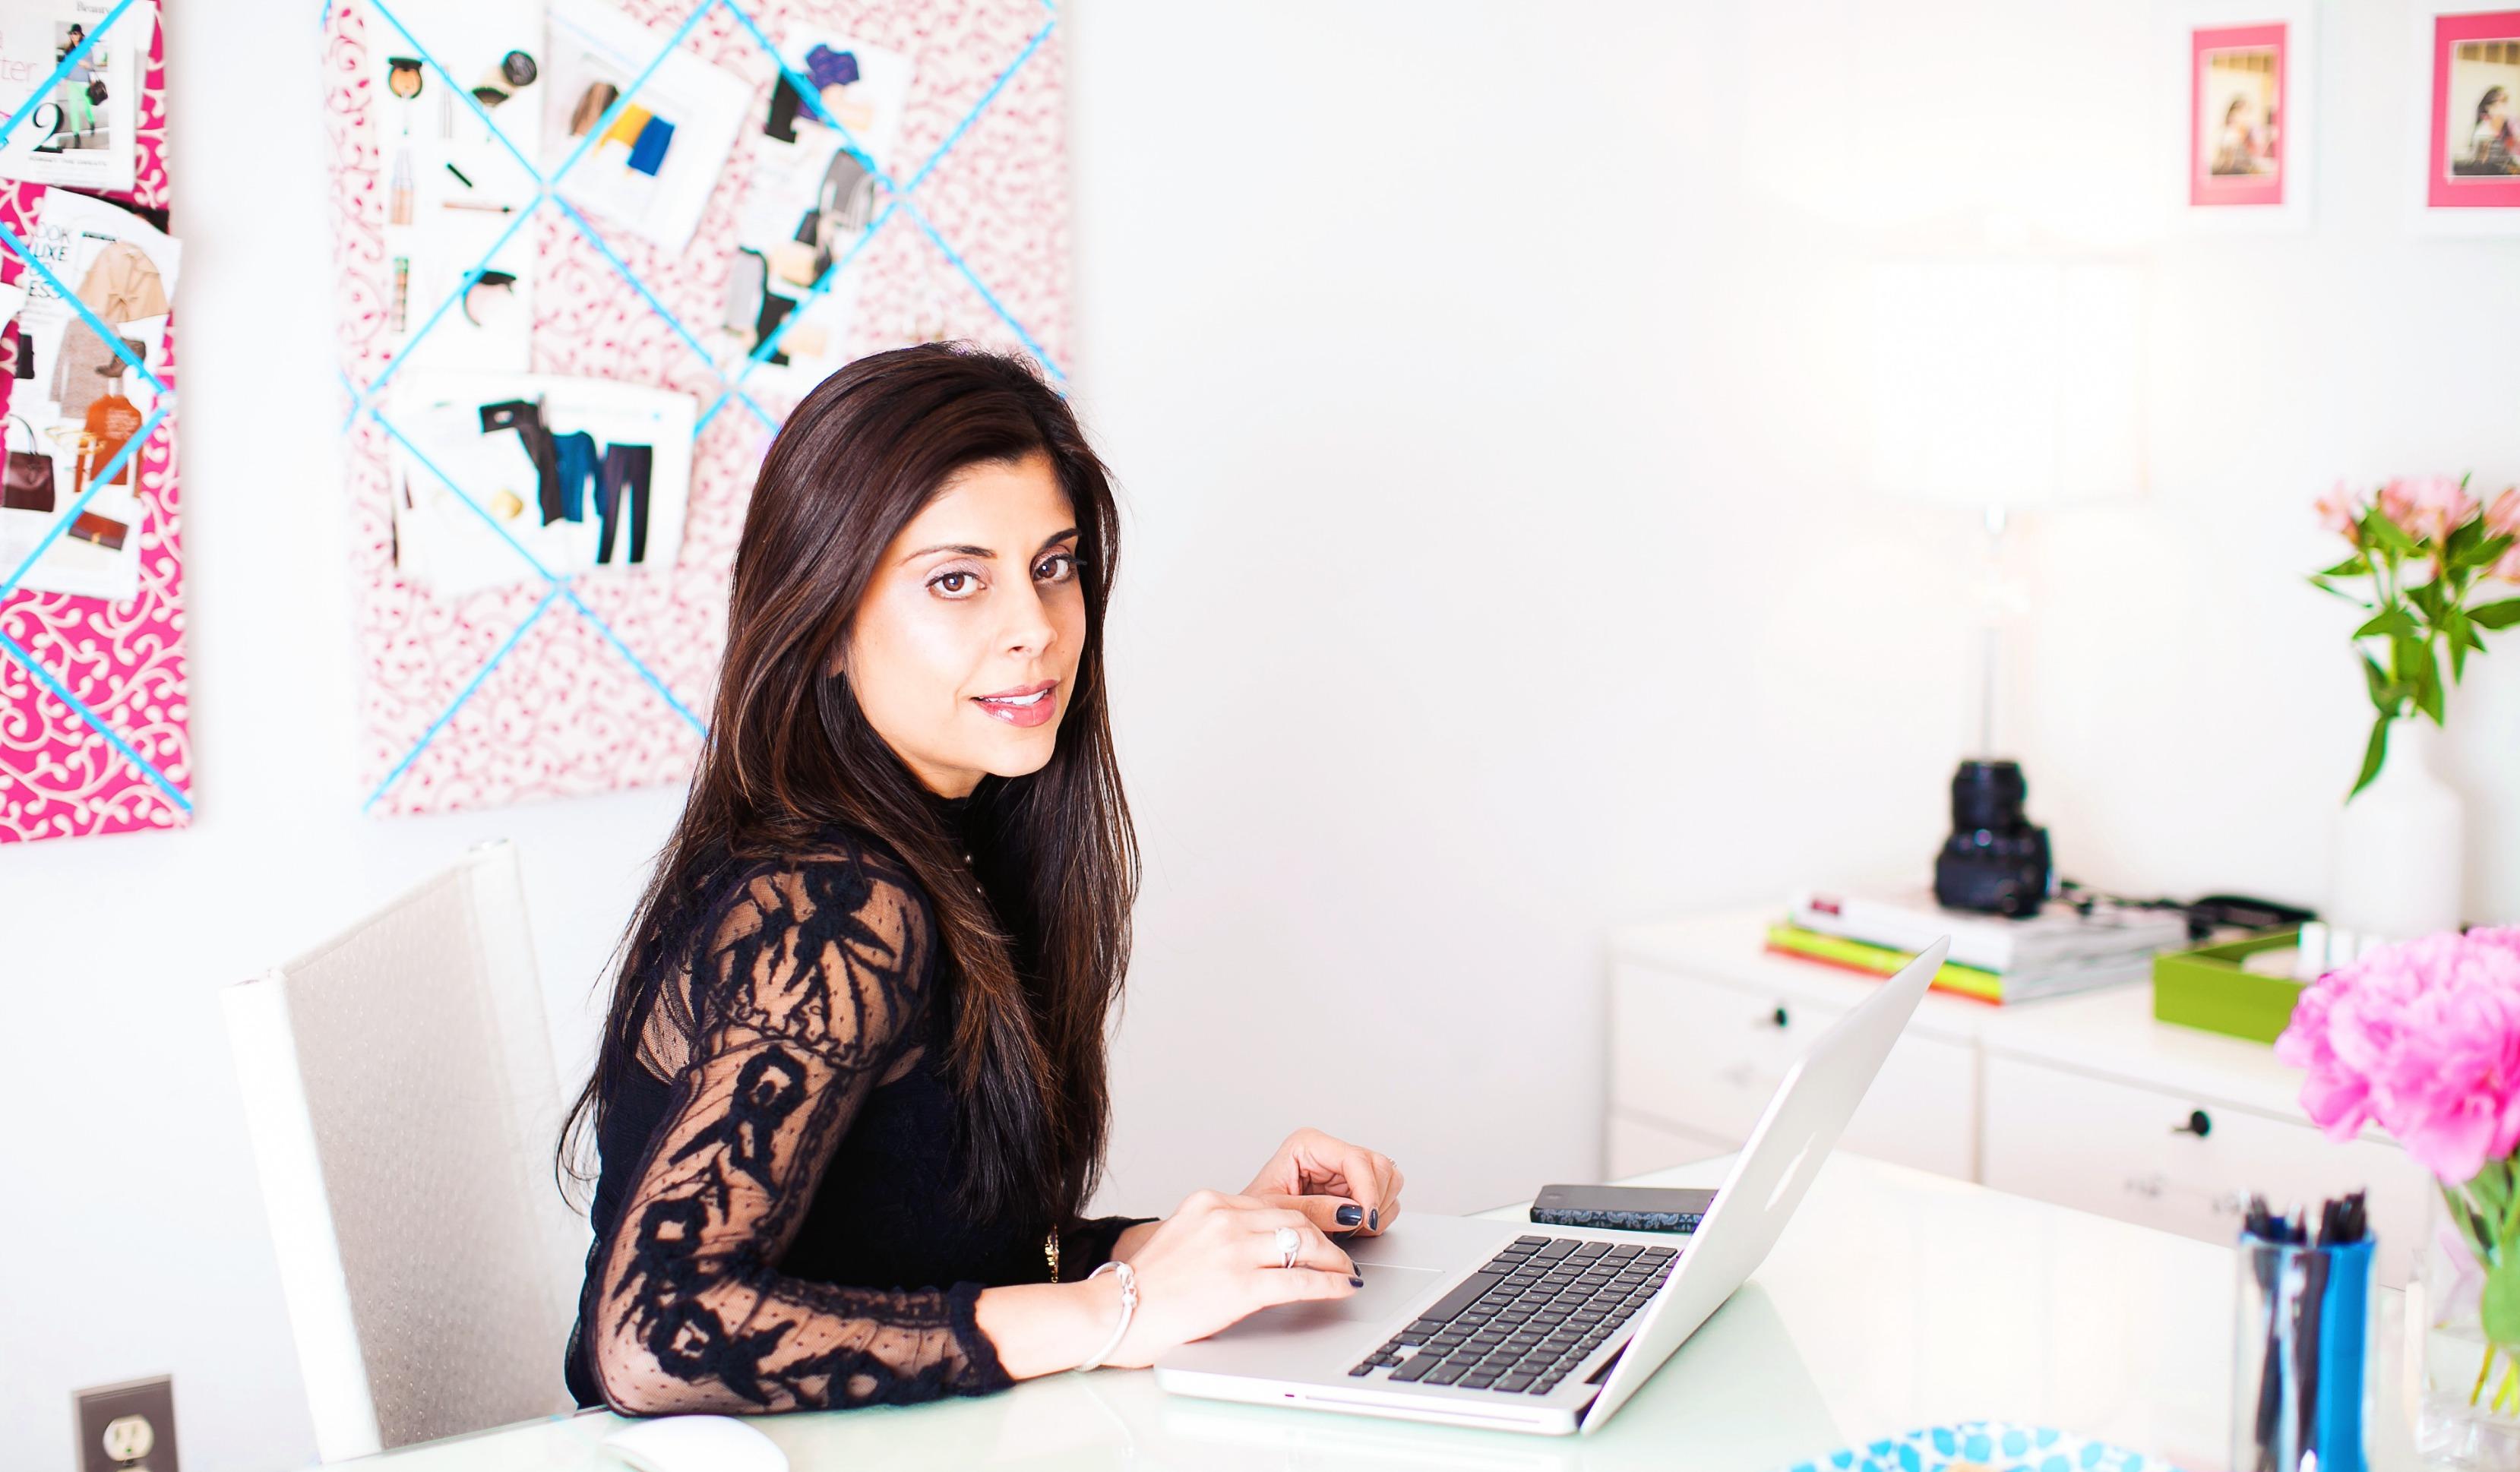 Naina Singla, Entrepreneur, Fashion Stylist, On-Air Expert And Editor of STYLE'N.com